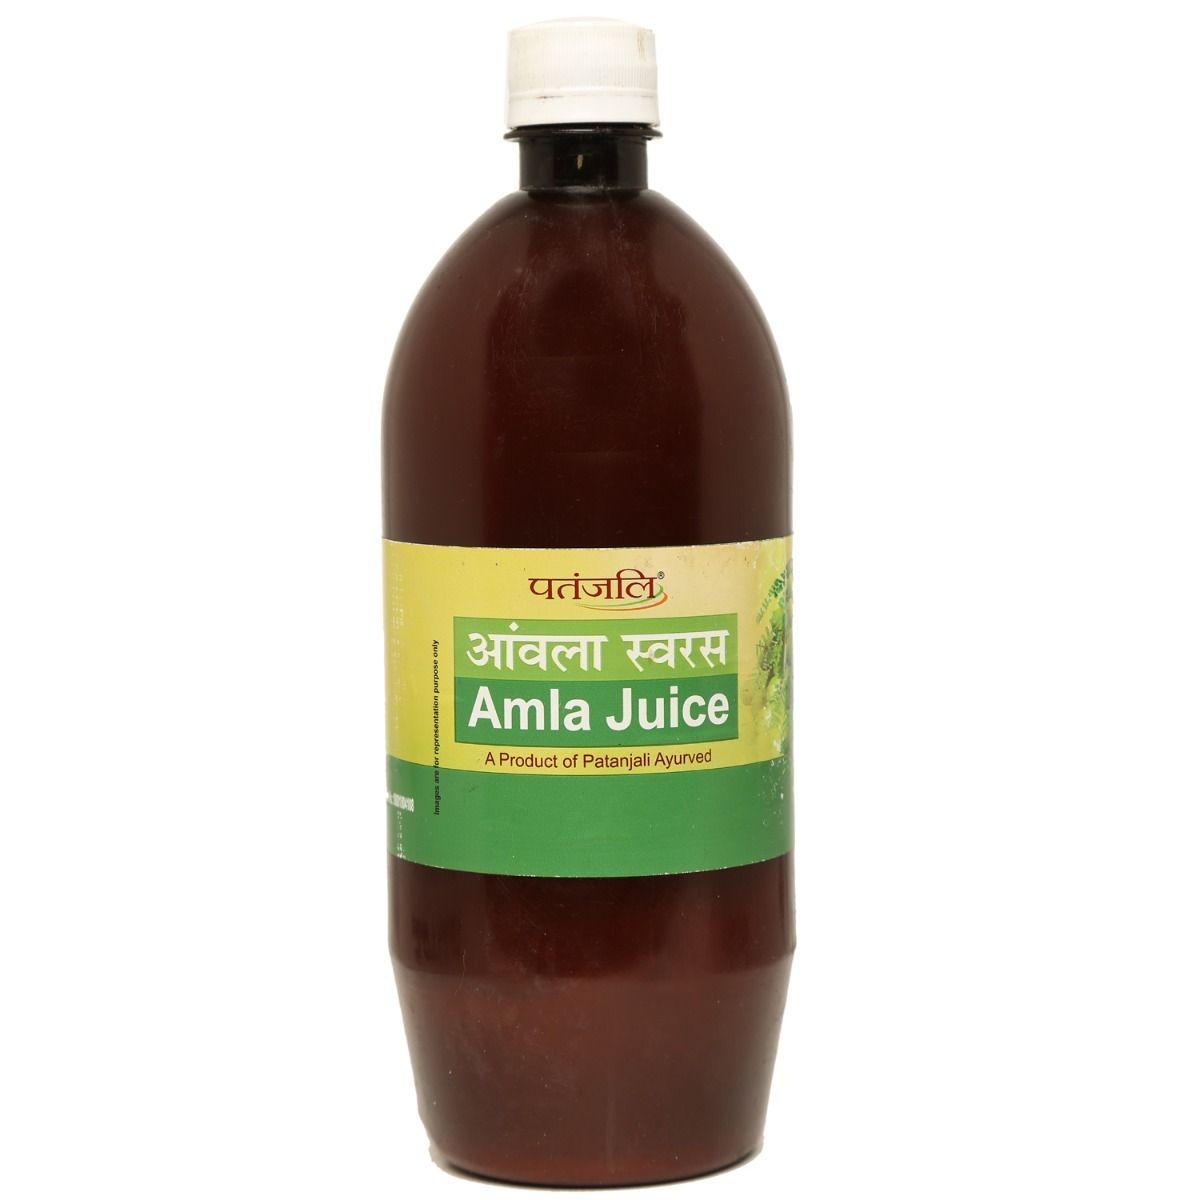 Patanjali Amla Juice, 1 Litre